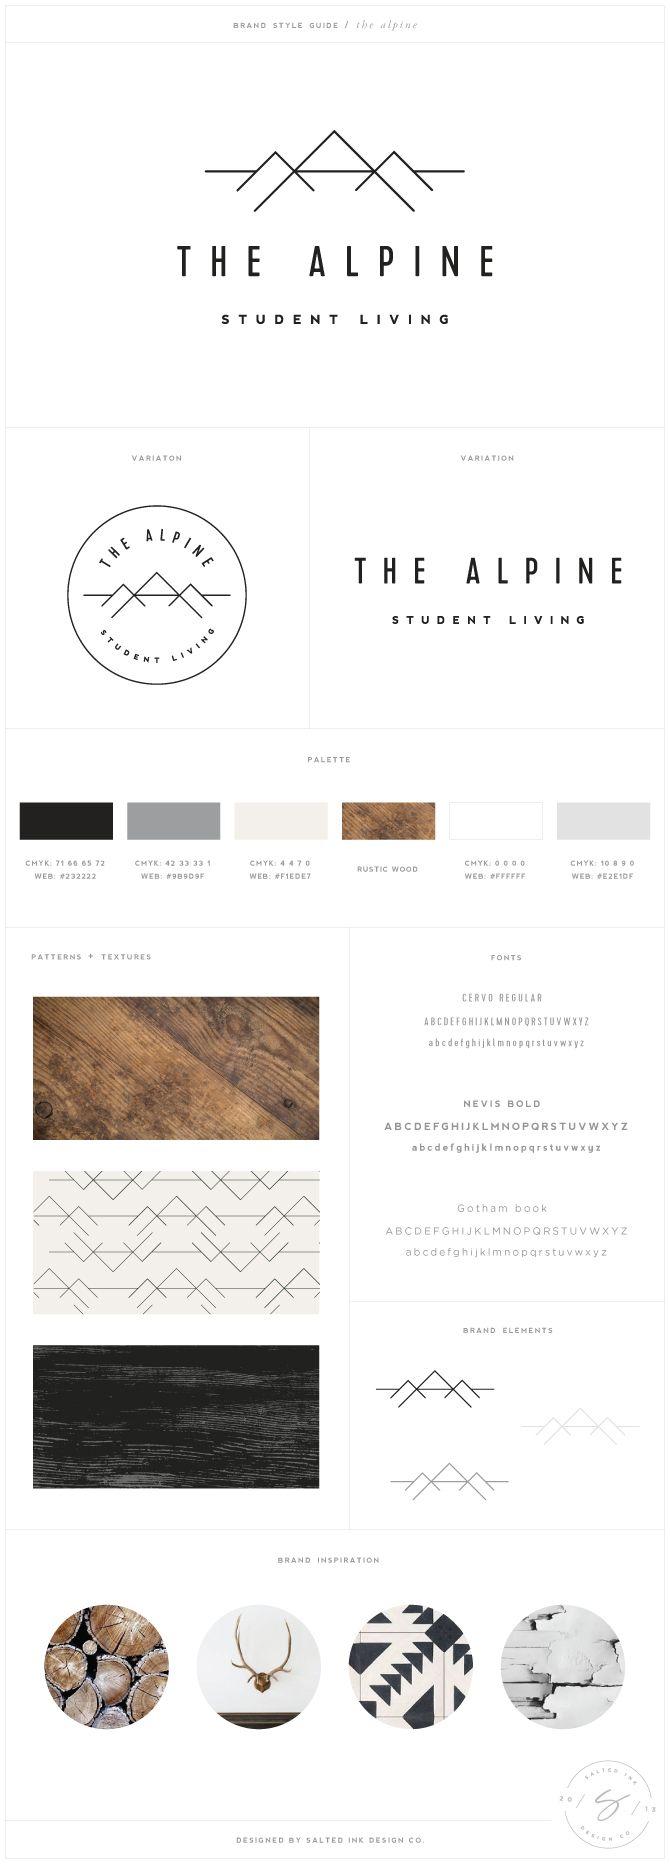 Brand Launch The Alpine Graphic Design Branding Branding Design Brand Identity Design